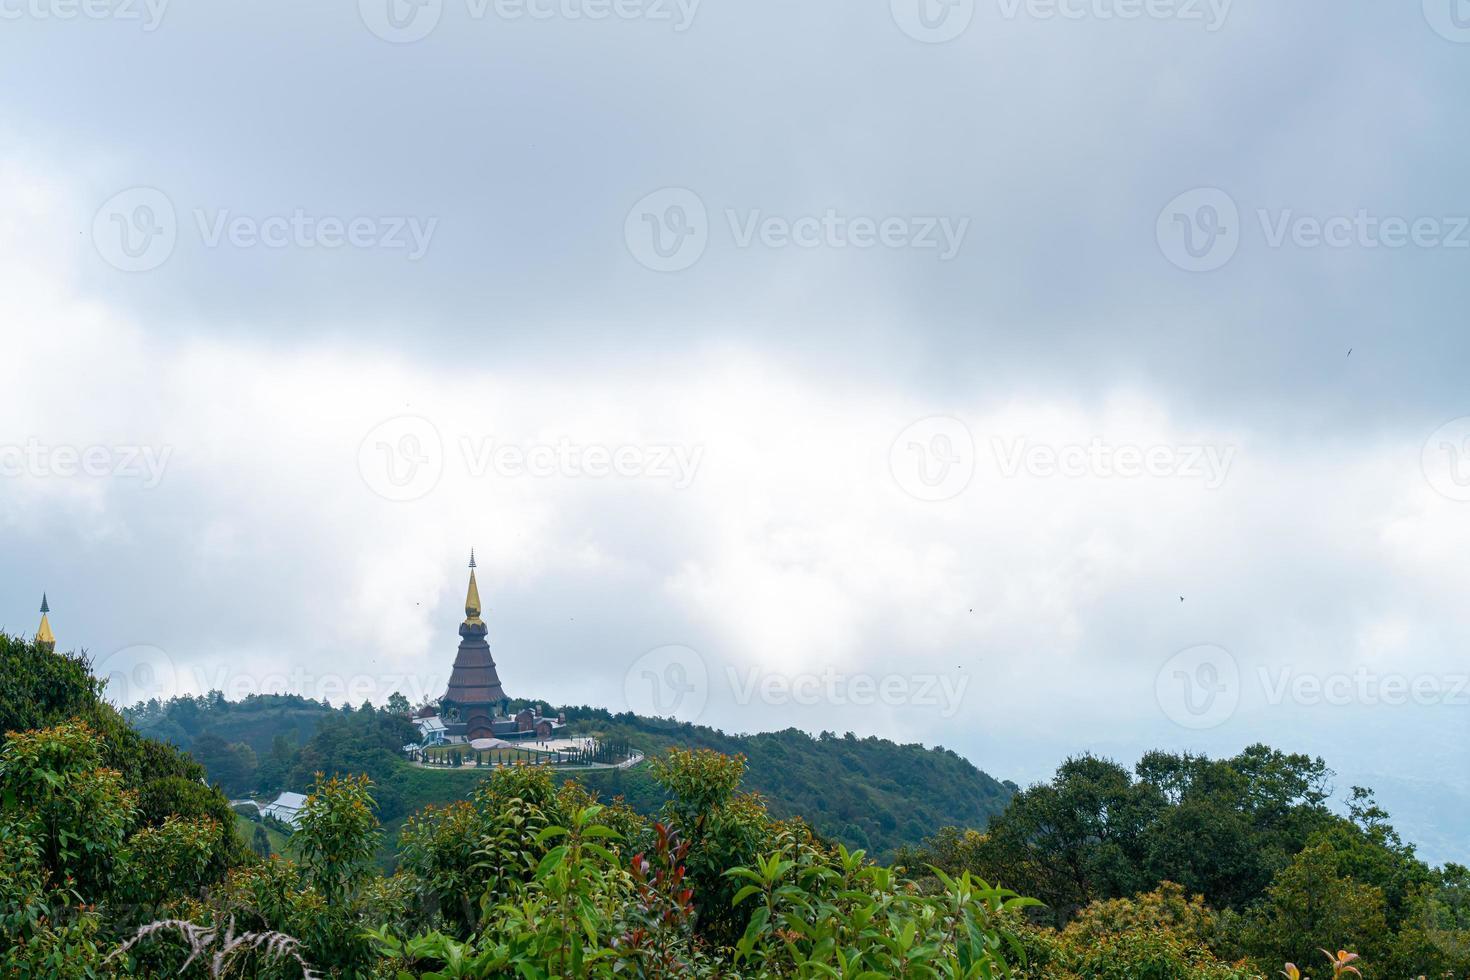 pagoda histórica en el parque nacional doi inthanon en chiang mai, tailandia. foto